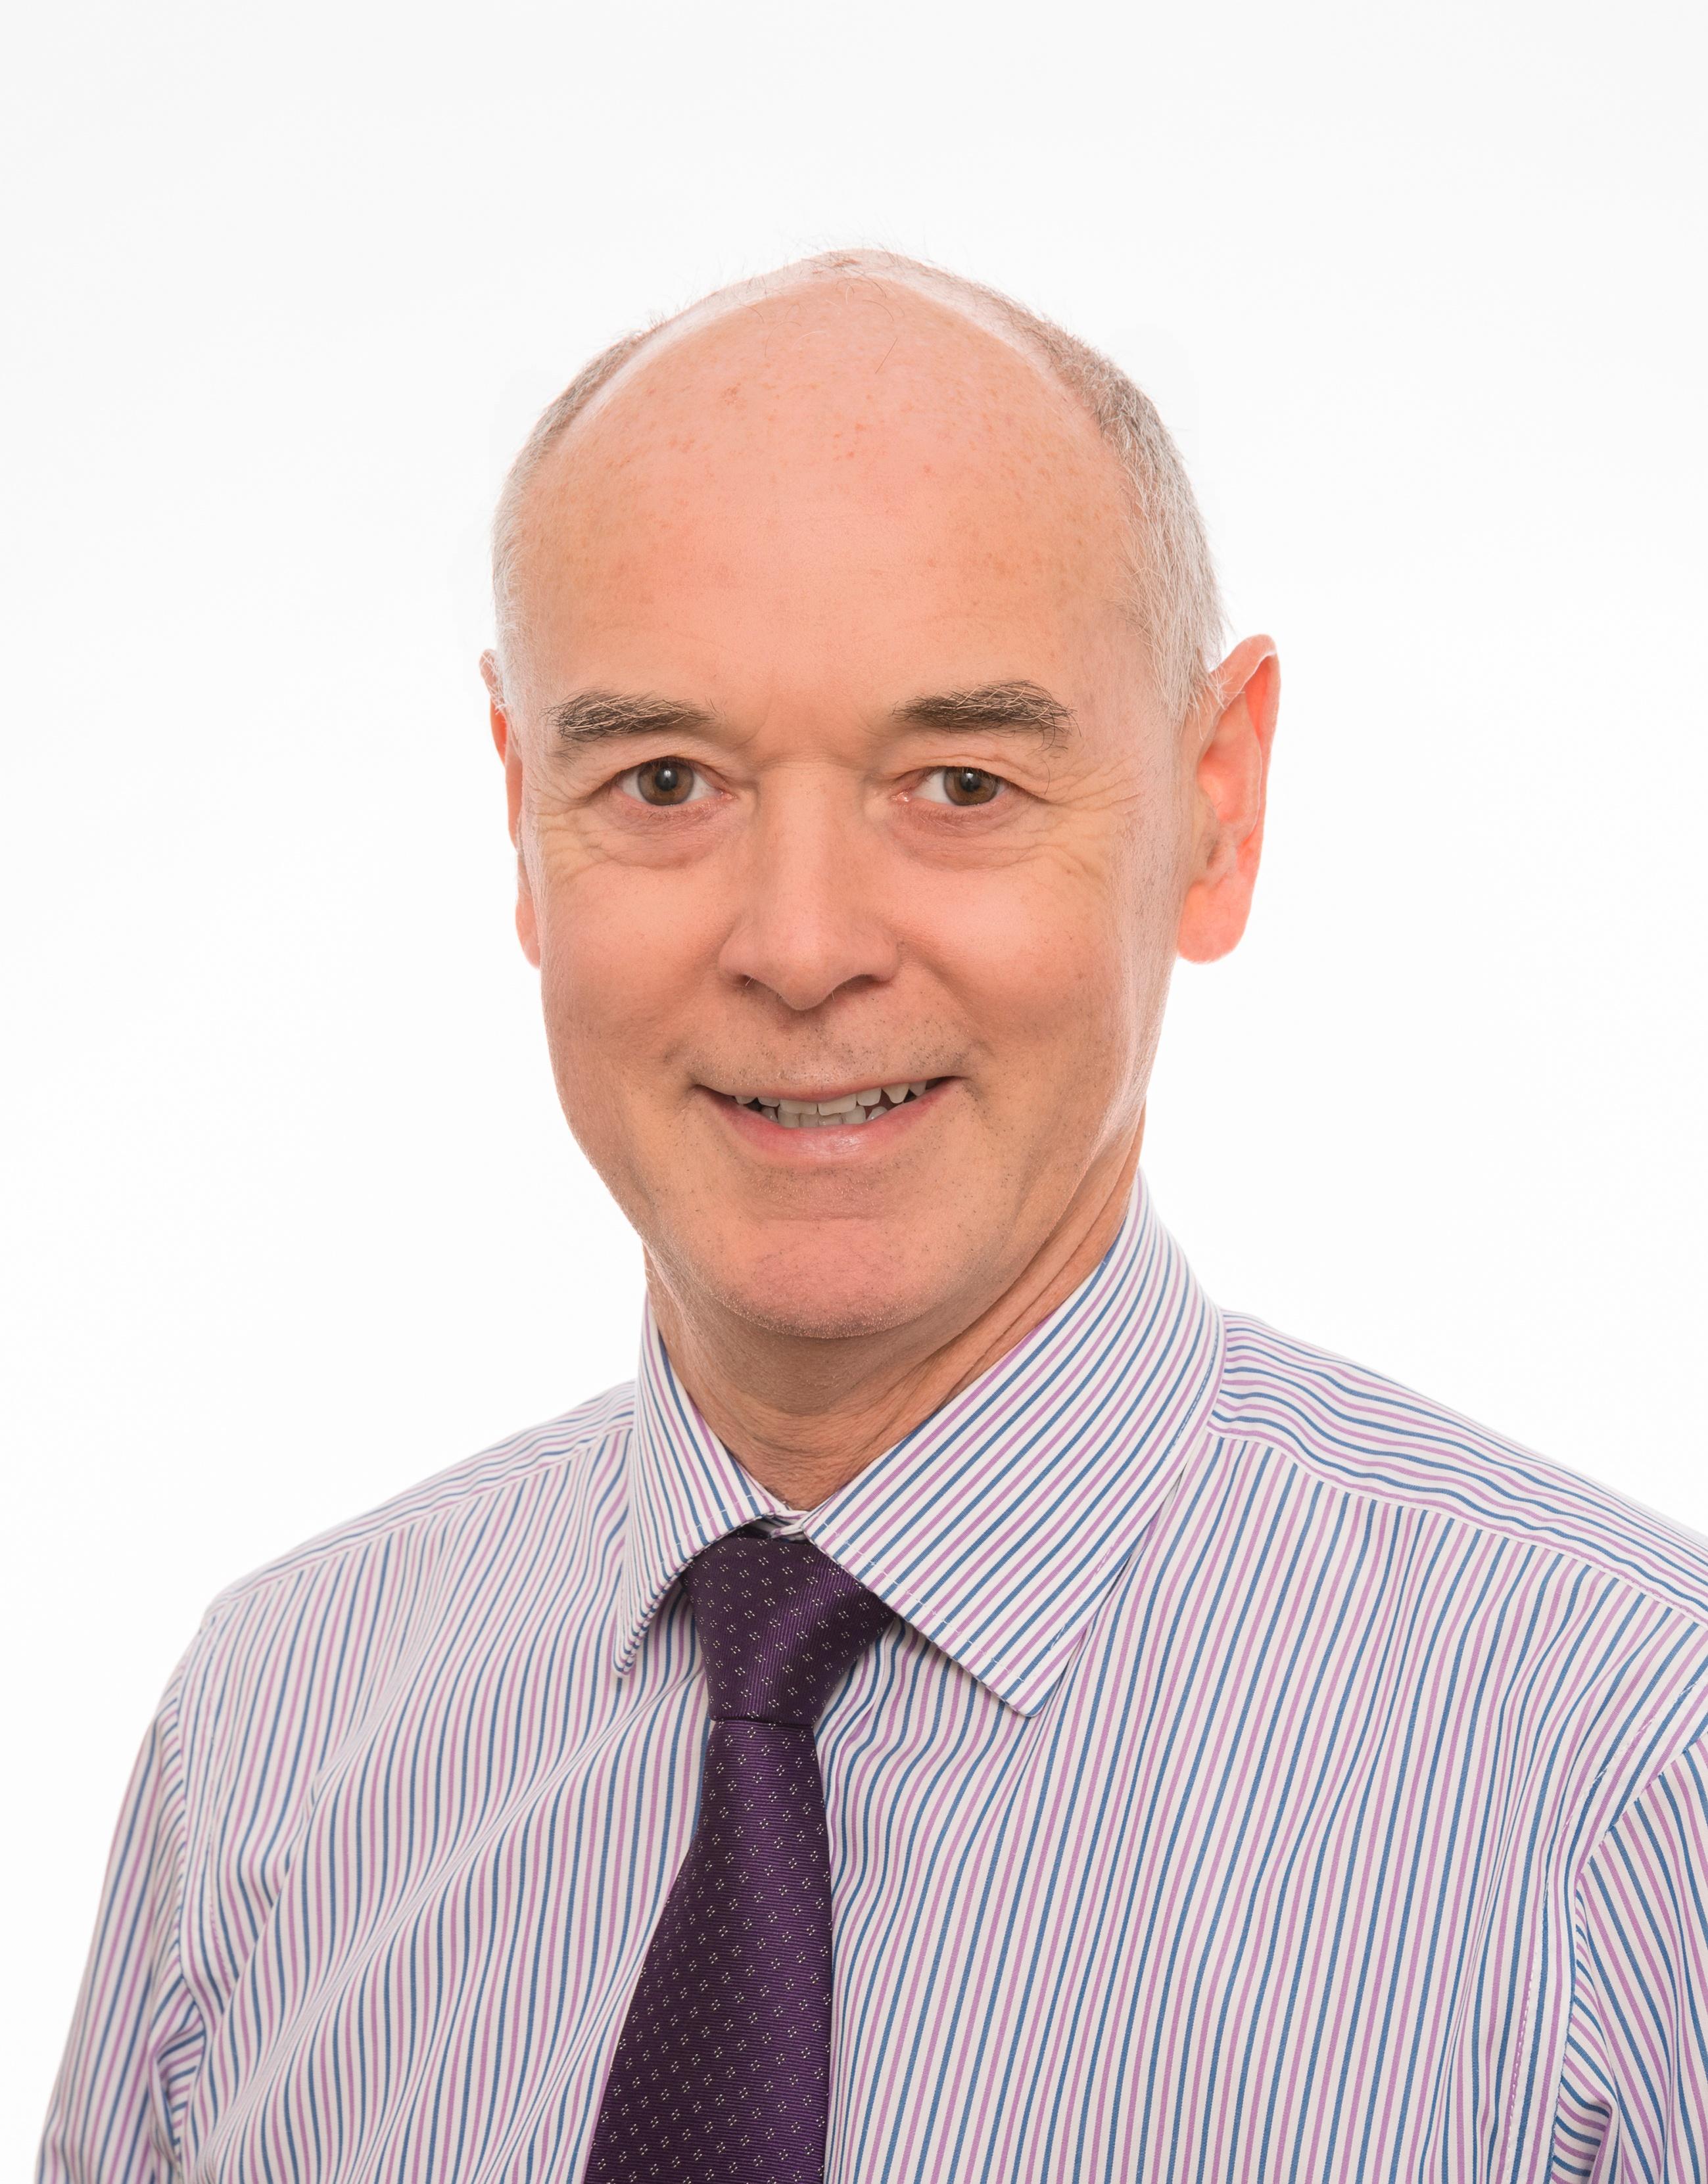 David Welling